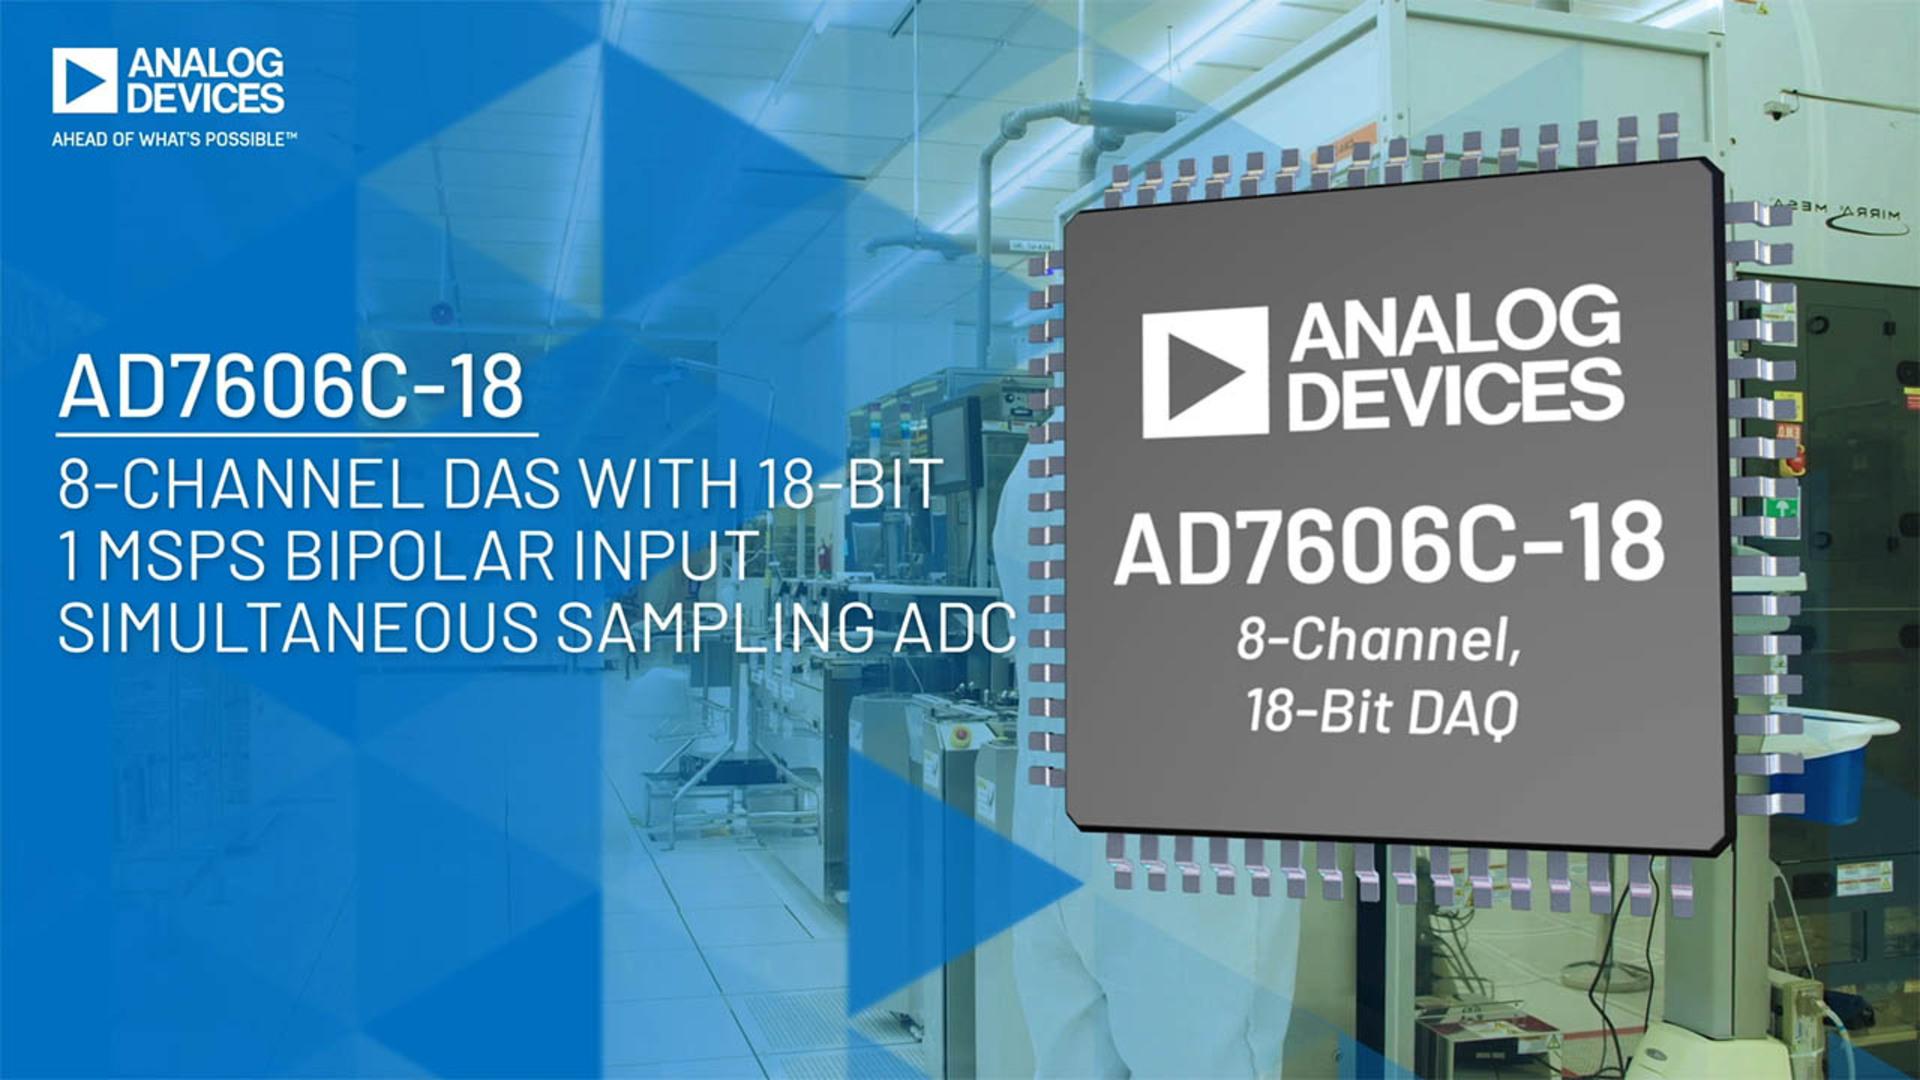 AD7606C-18: 8-Channel DAS, 1MSPS Input, Simultaneous Sampling ADC